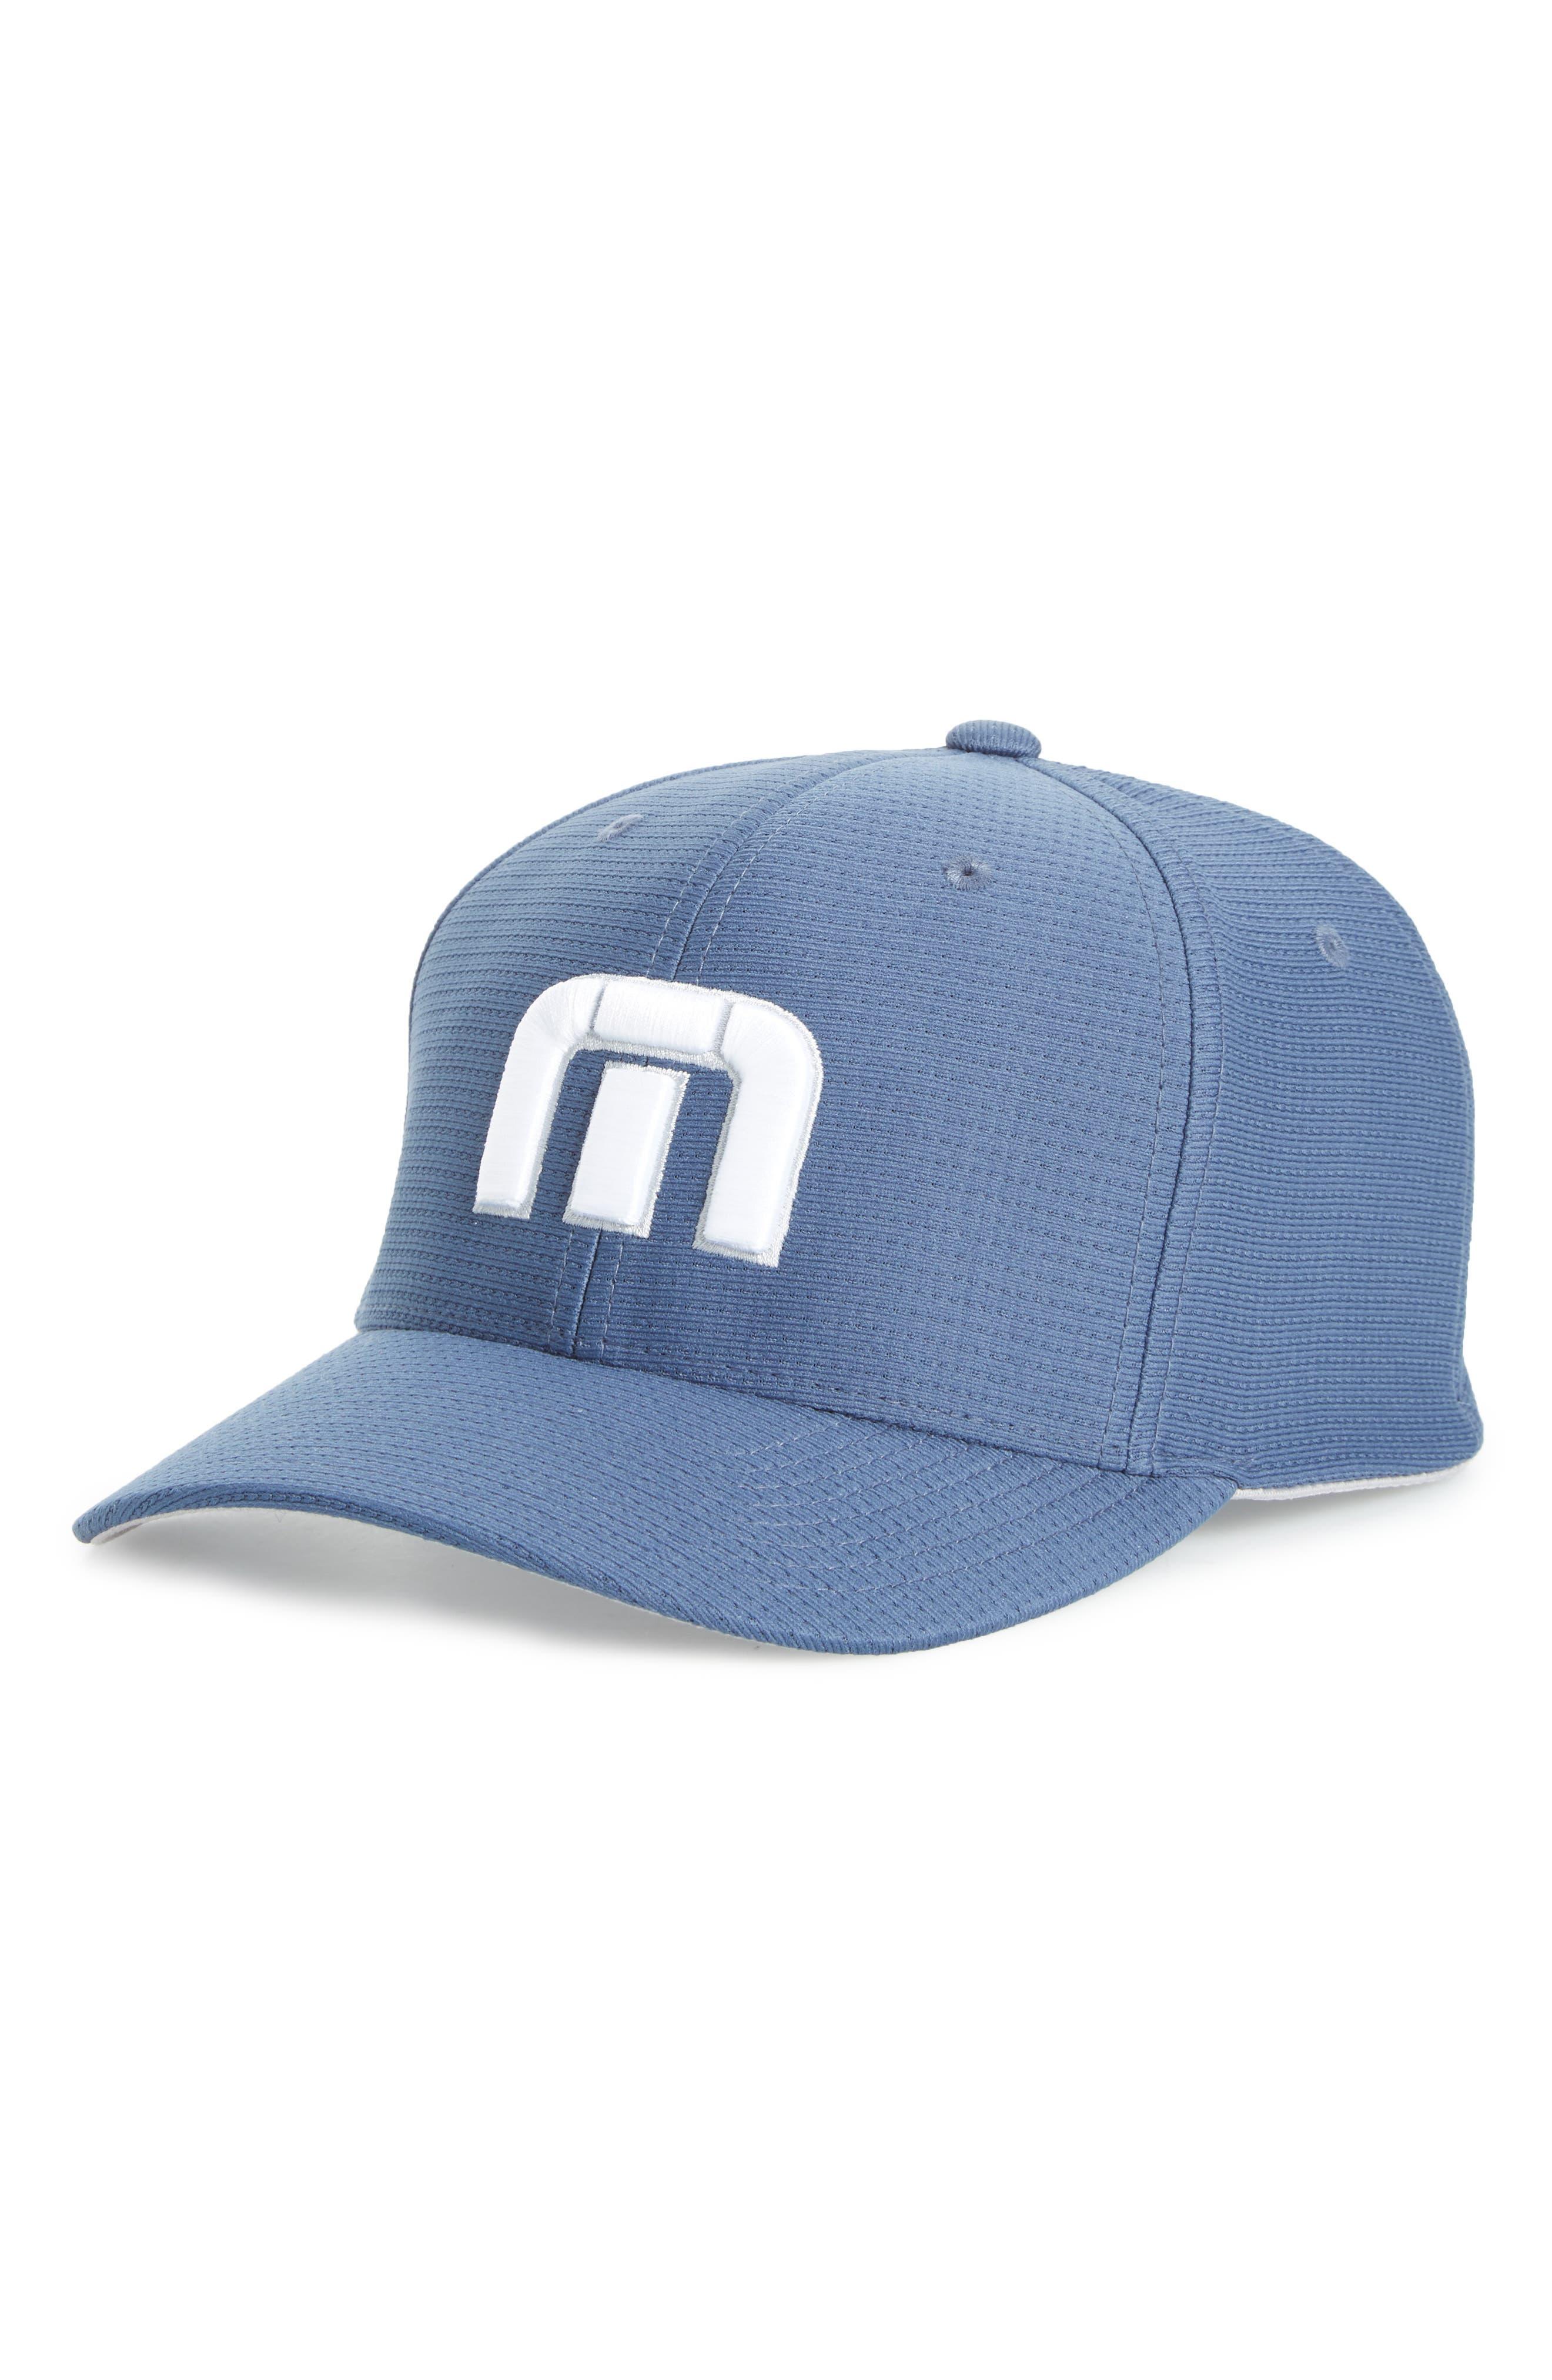 Main Image - Travis Mathew 'B-Bahamas' Hat